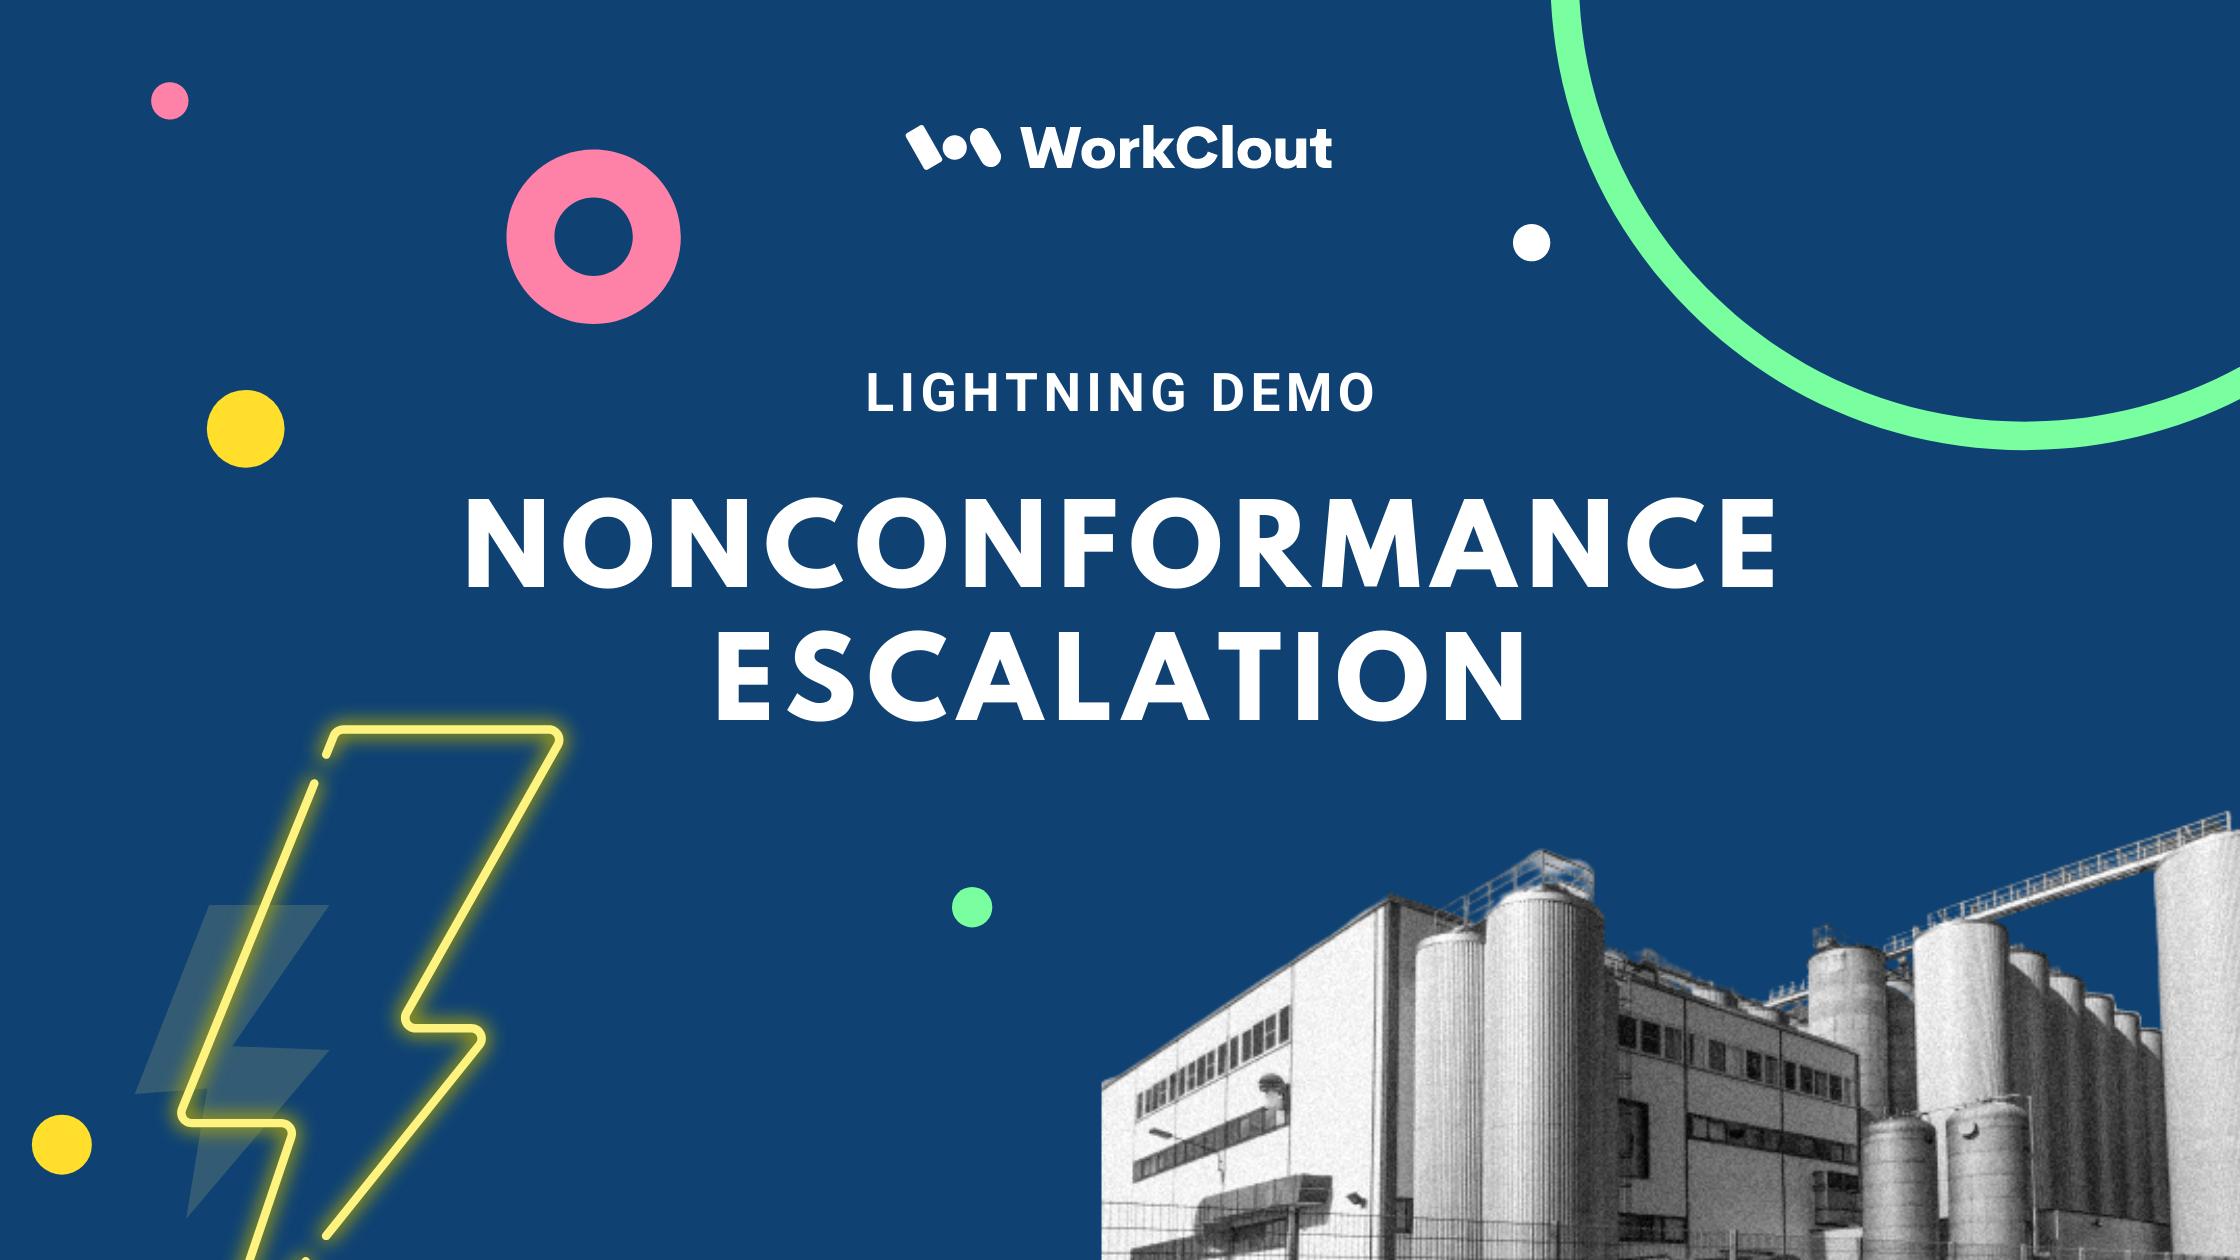 Lightning Demo - Nonconformance Escalation